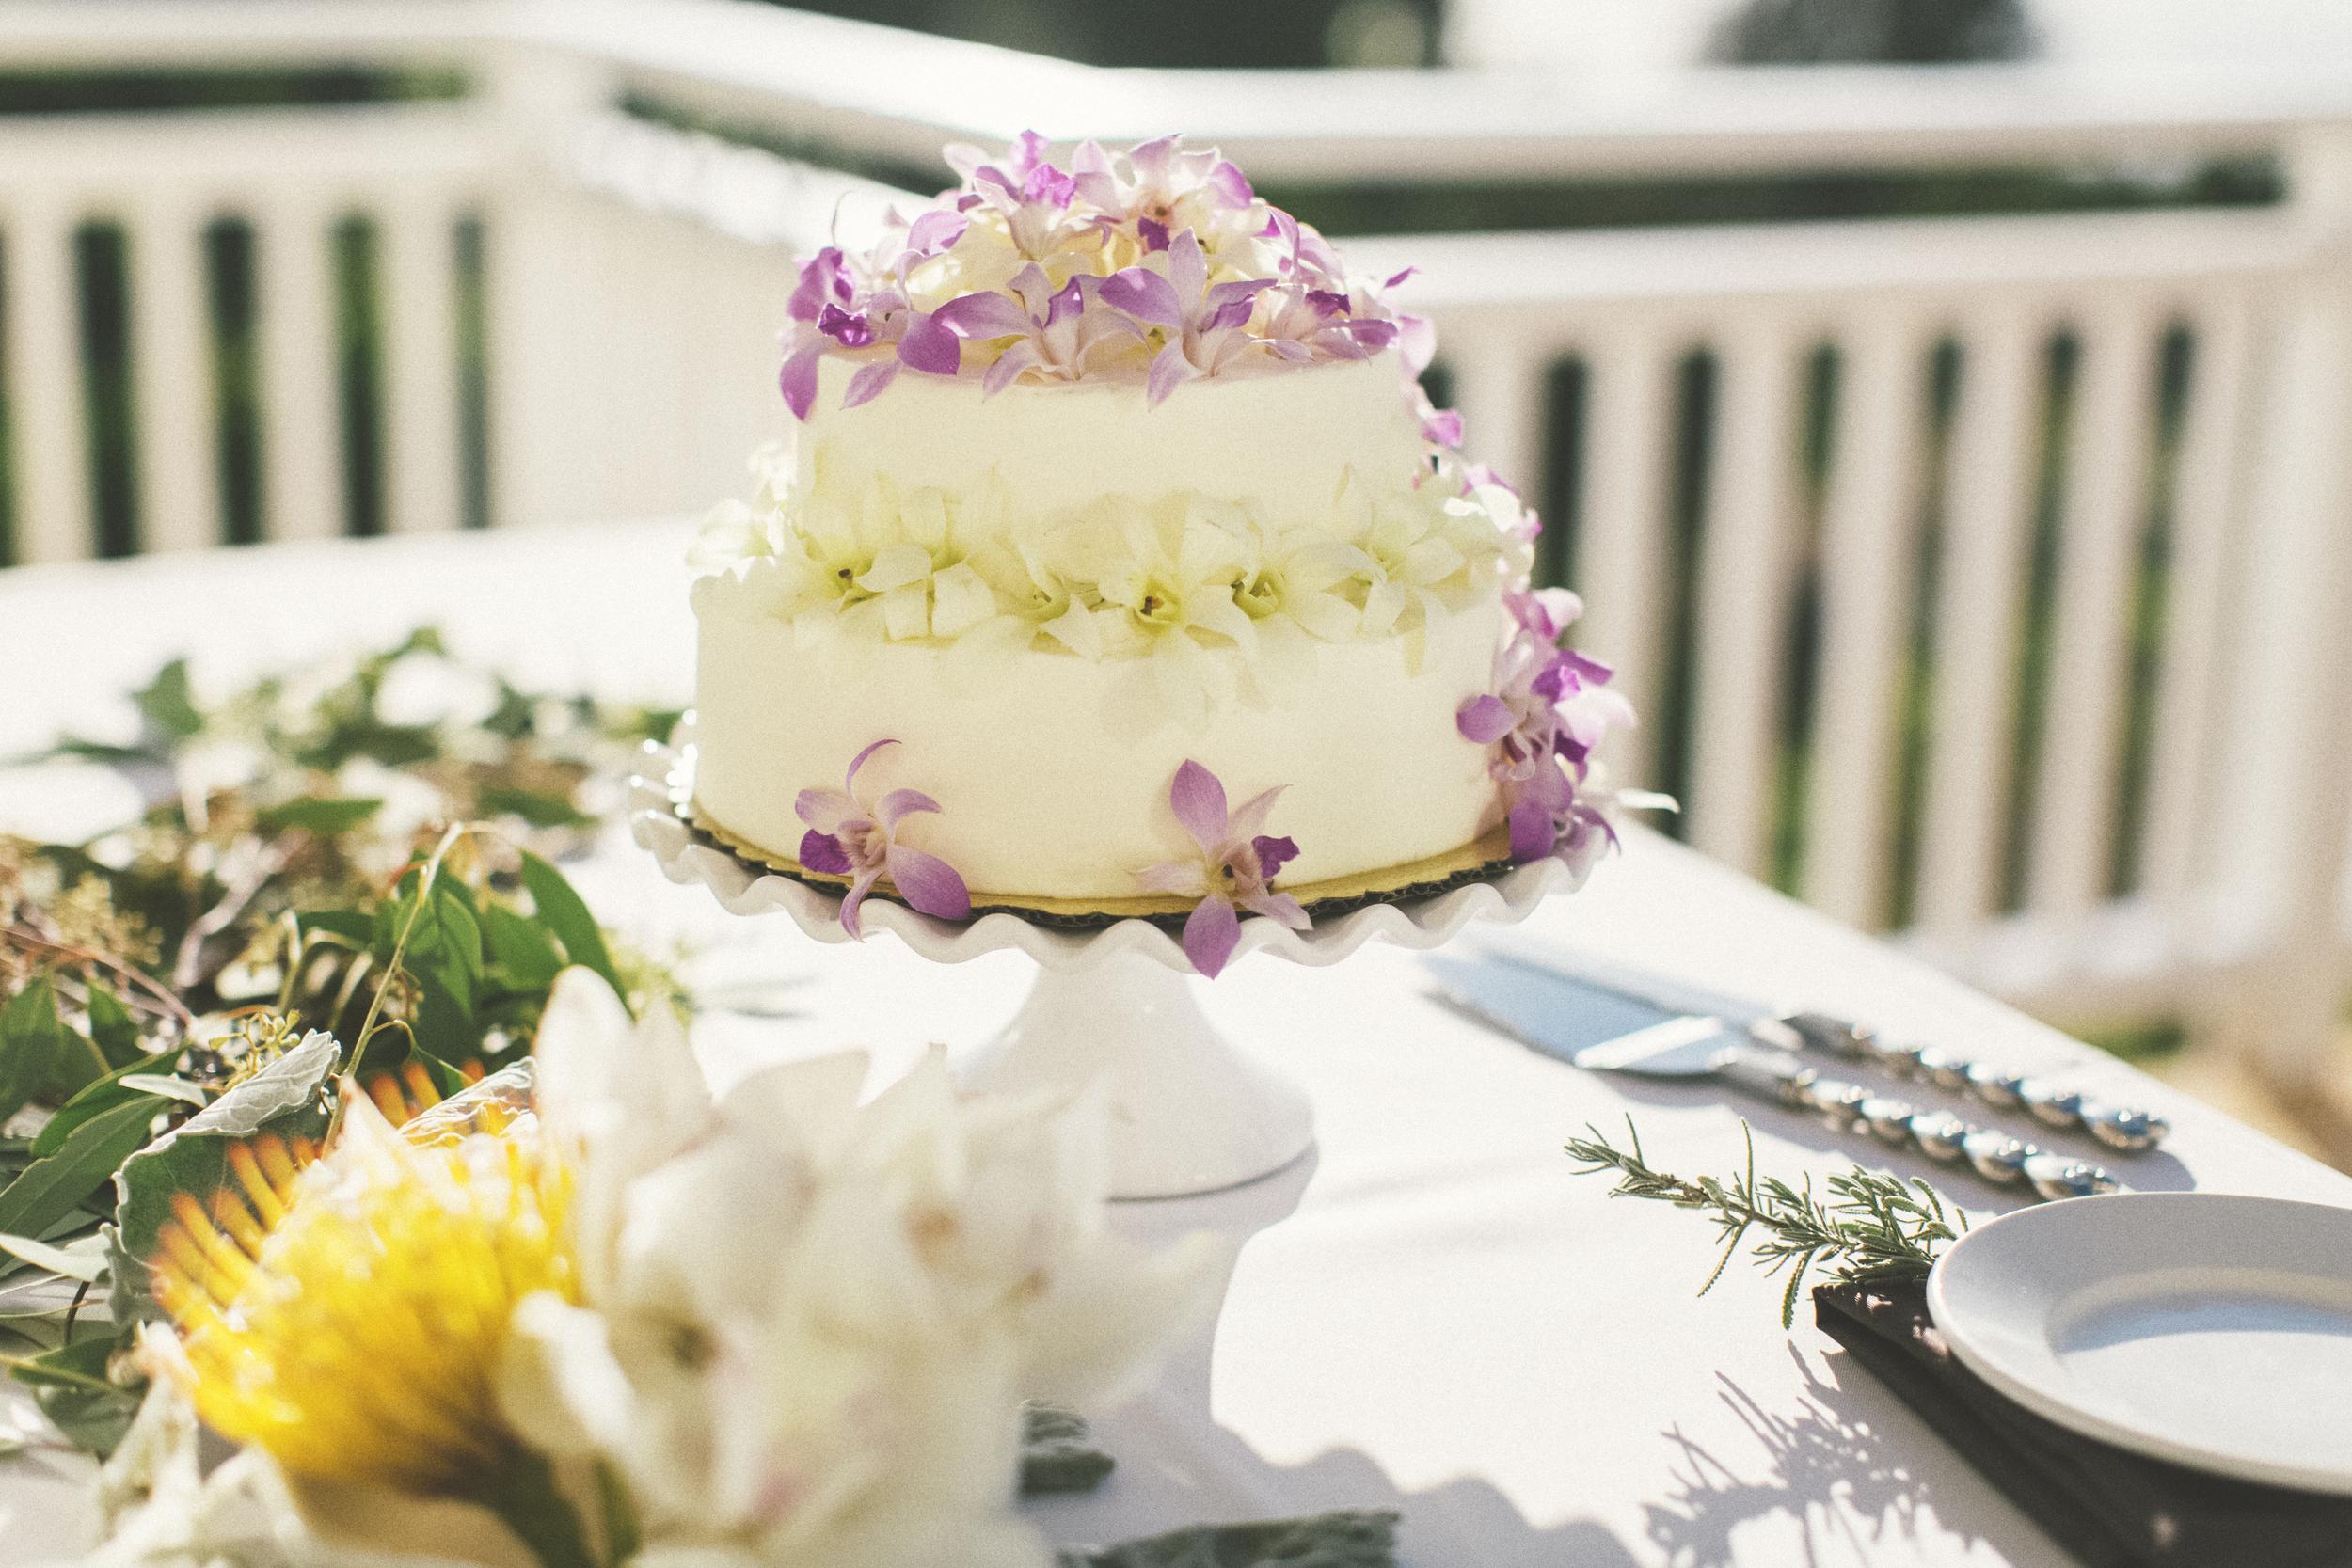 angie-diaz-photography-maui-wedding-103.jpg